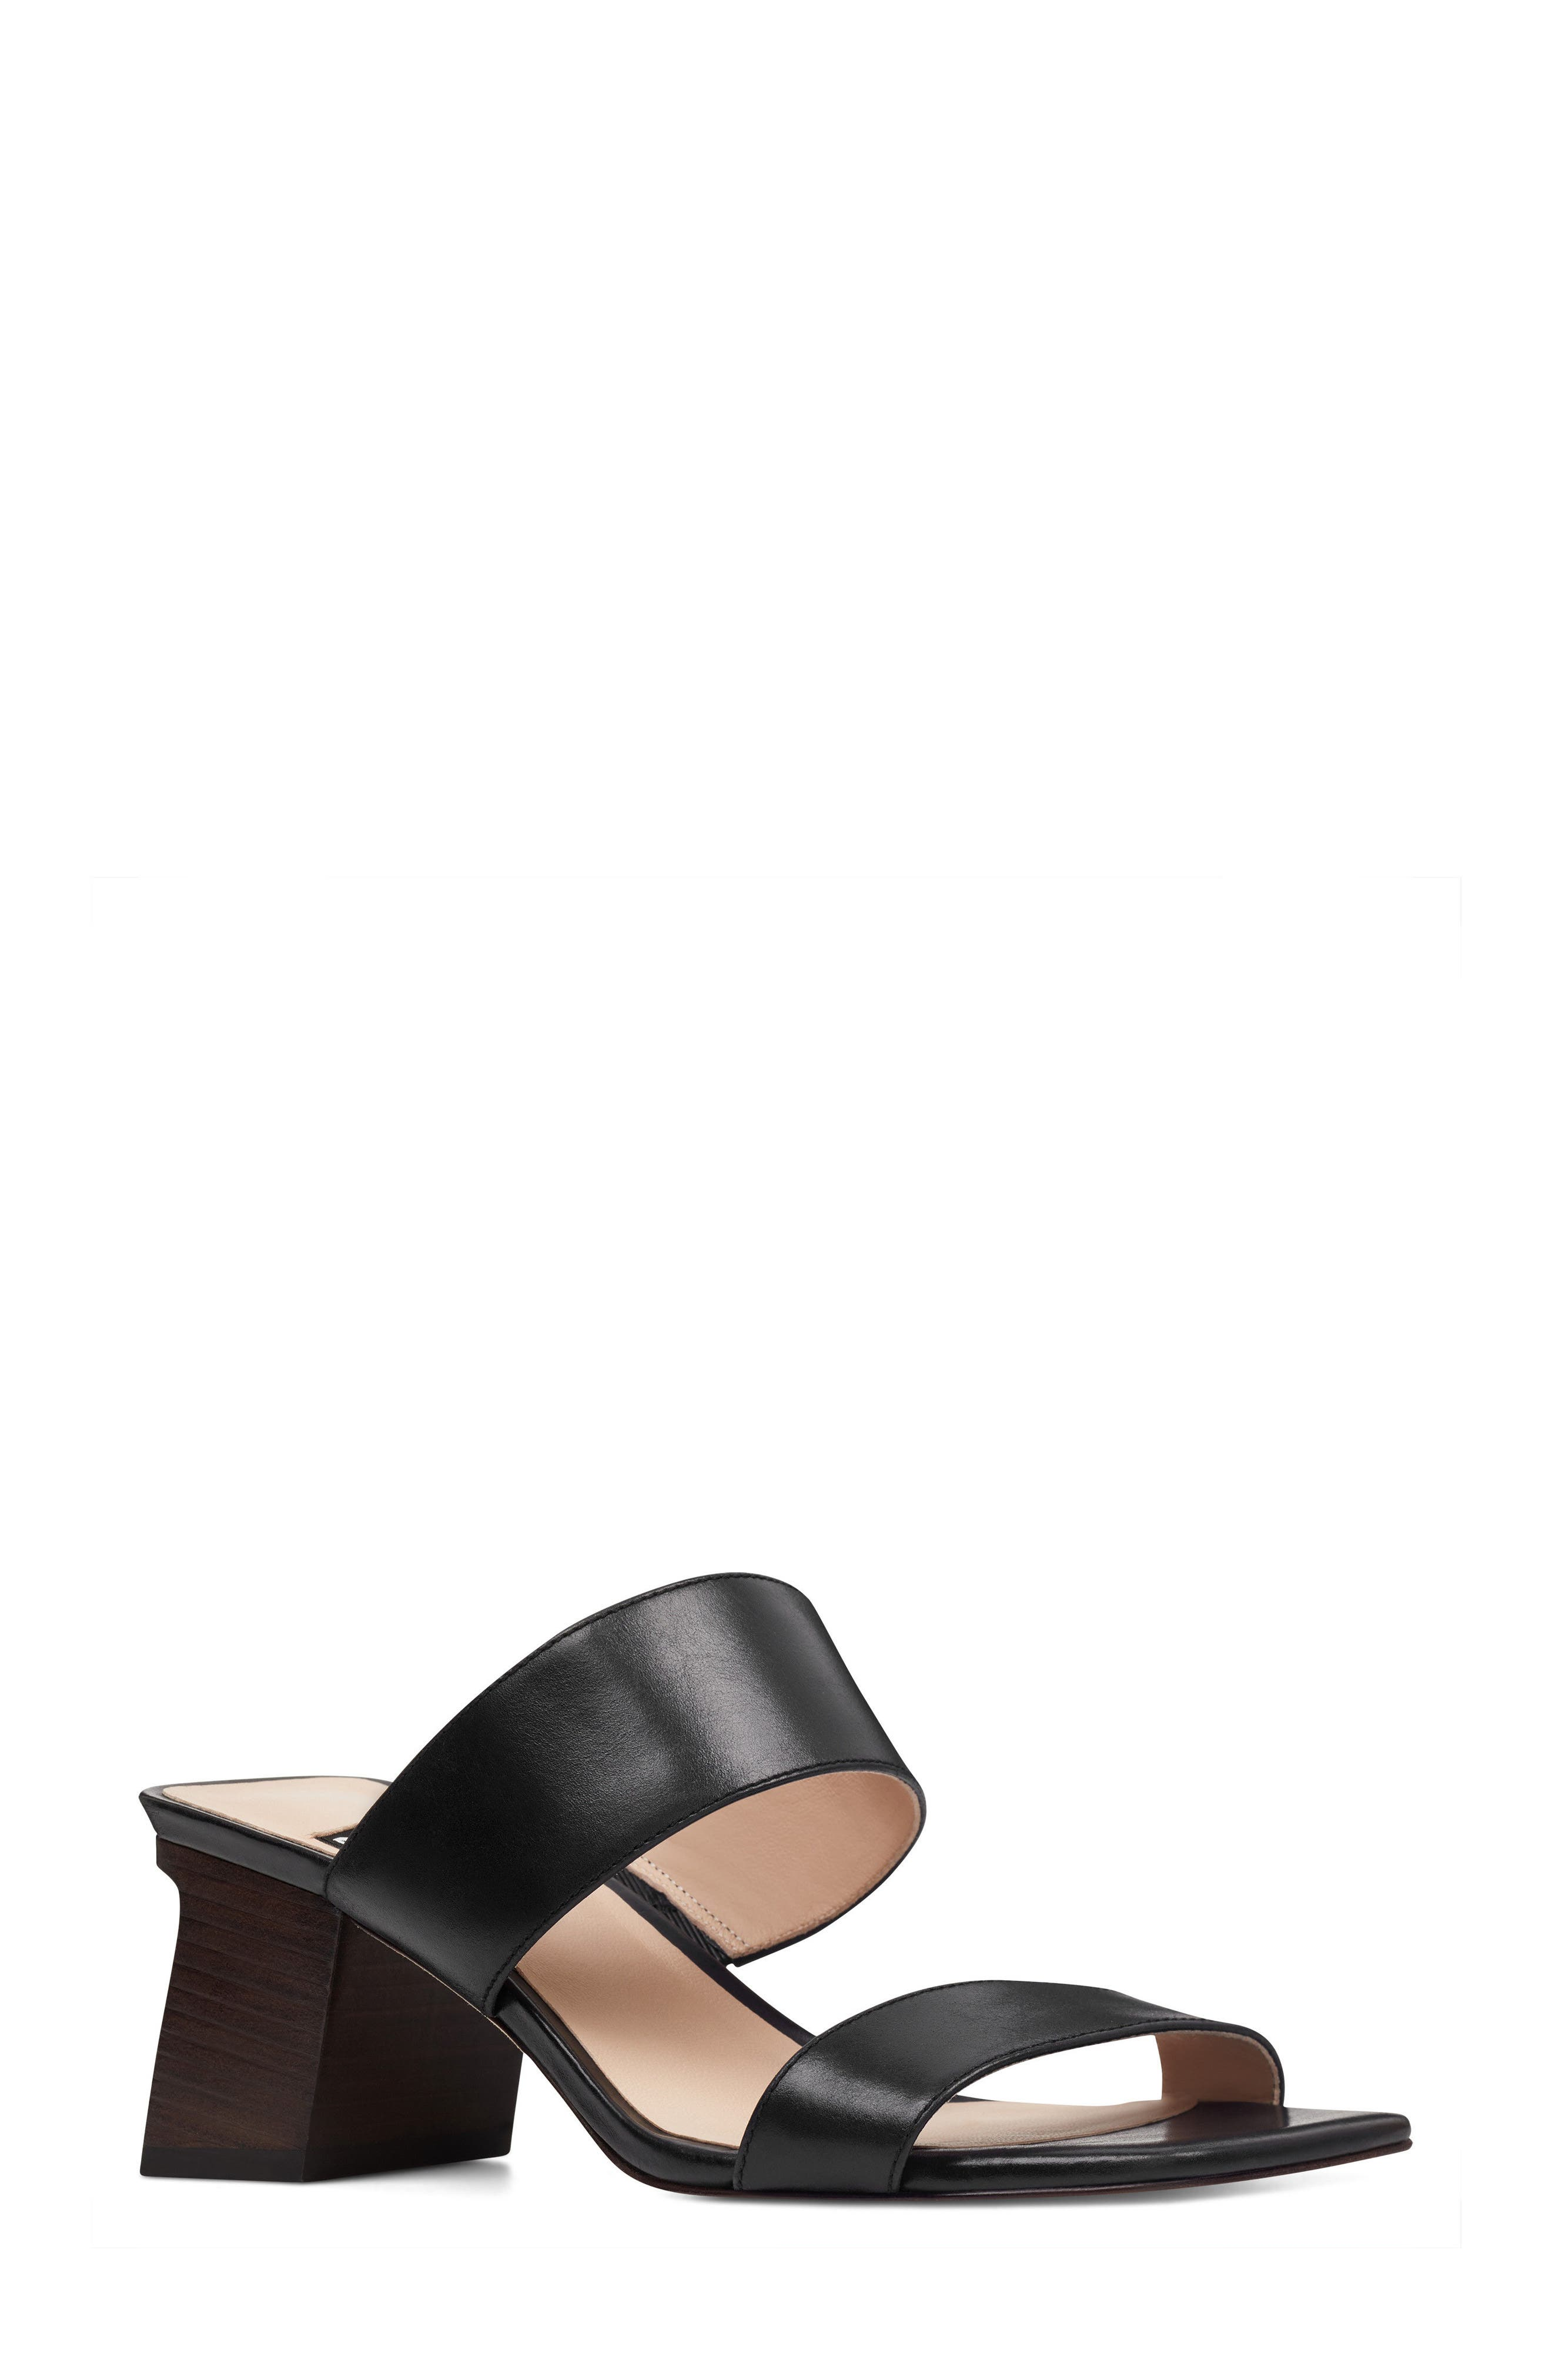 Churen - 40th Anniversary Capsule Collection Sandal,                             Main thumbnail 1, color,                             BLACK LEATHER